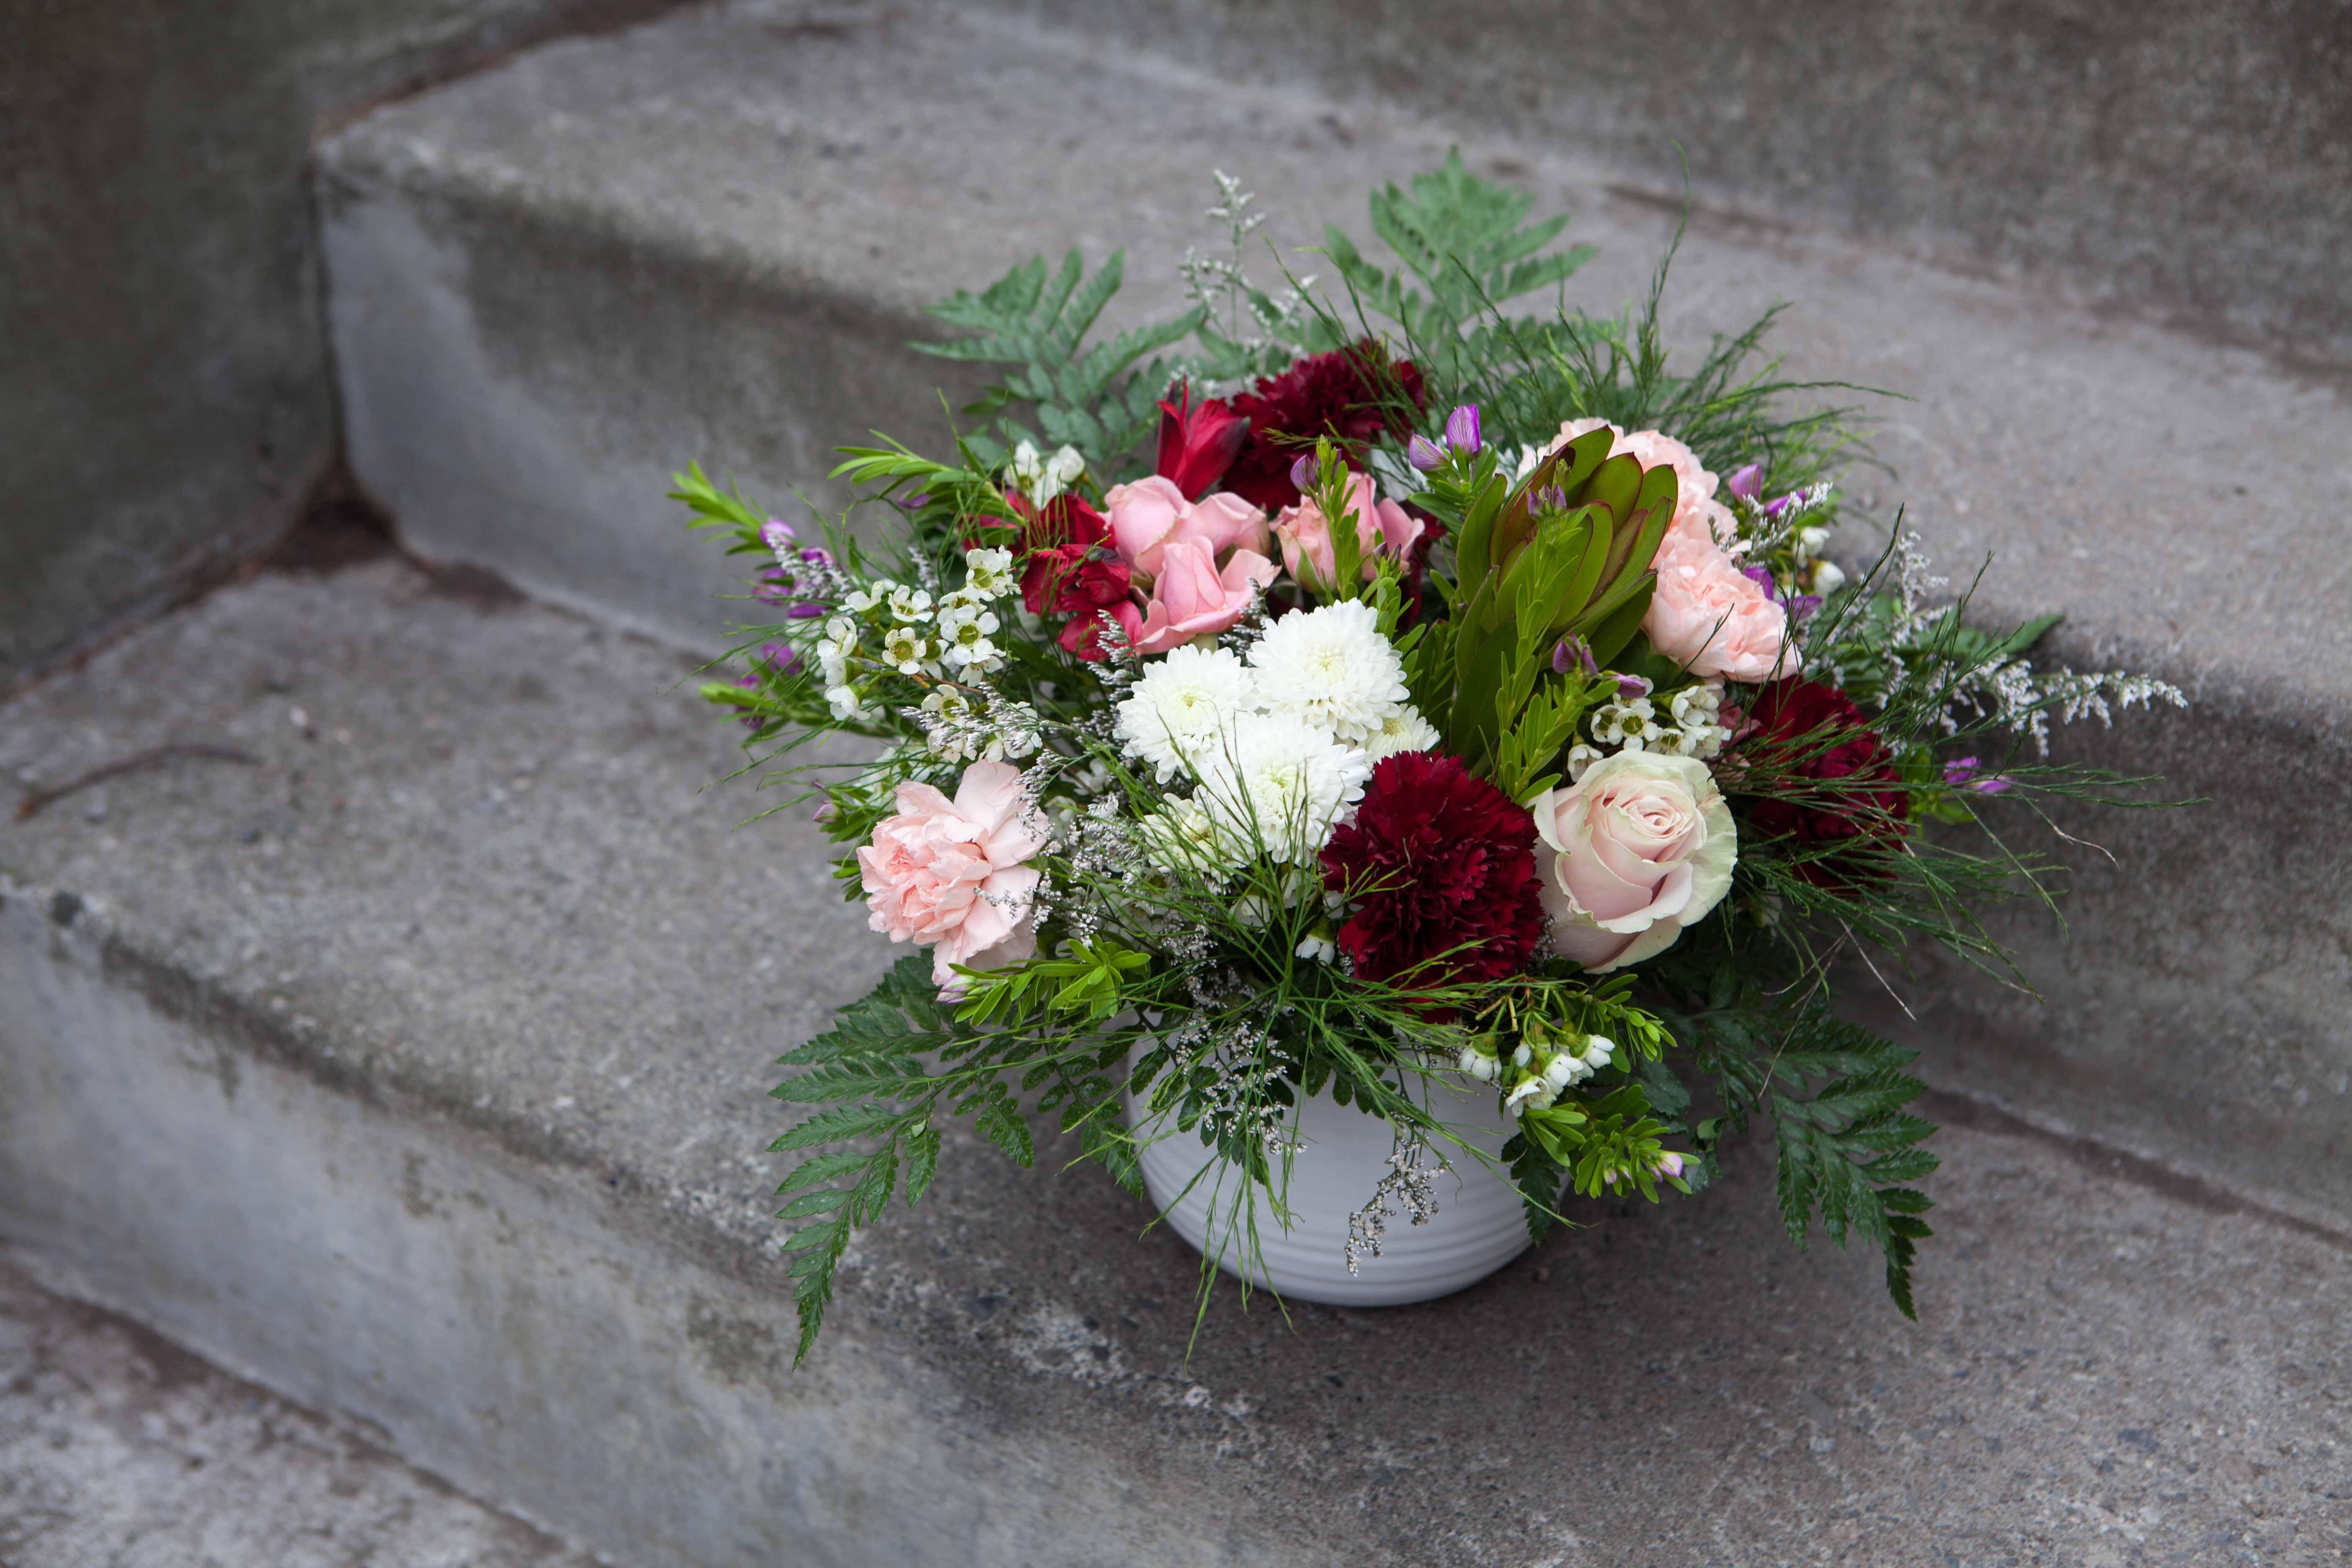 Flower arrangement by Anchorage florist Natasha Price of Paper Peony Alaska, LLC